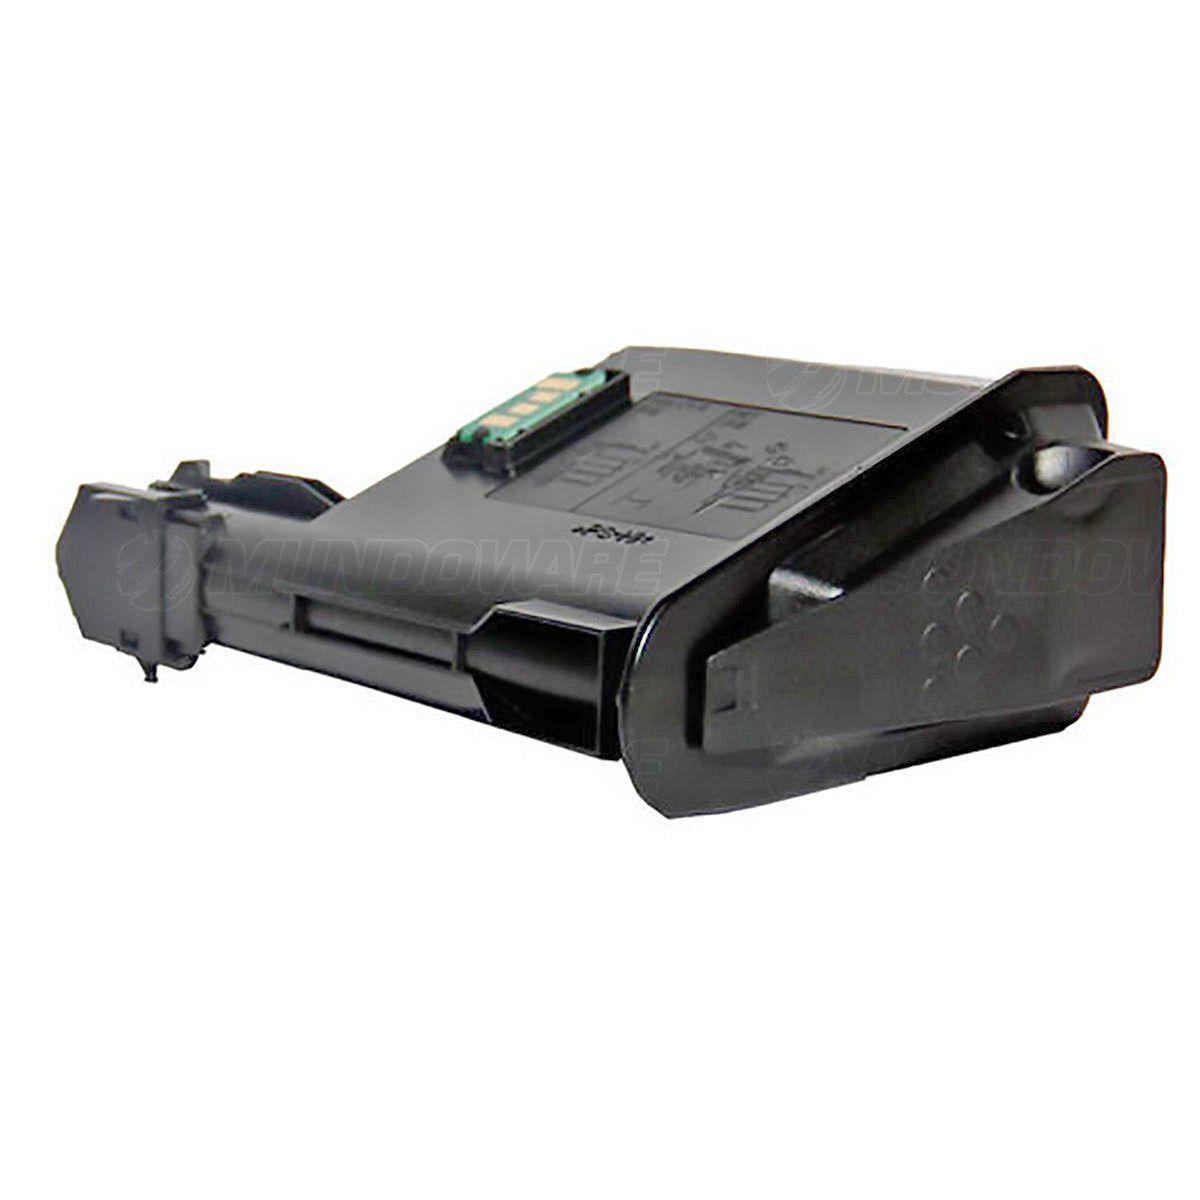 Compatível: Toner TK1122 TK-1122 para Kyocera FS-1025mfp FS-1125mfp FS-1060dn FS1025 FS1060 FS1125 / Preto / 2.300